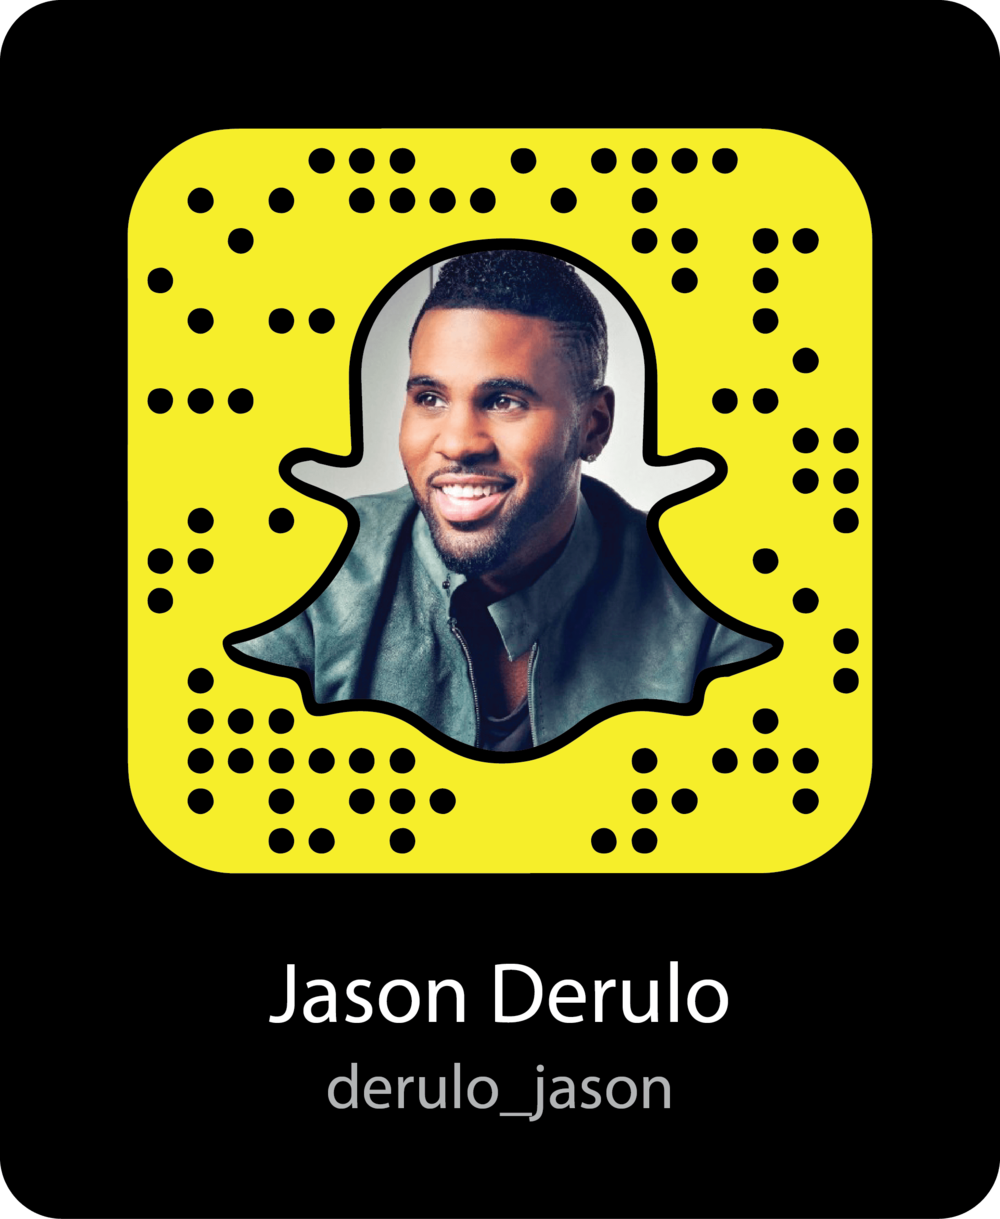 jason-derulo-celebrity-snapchat-snapcode